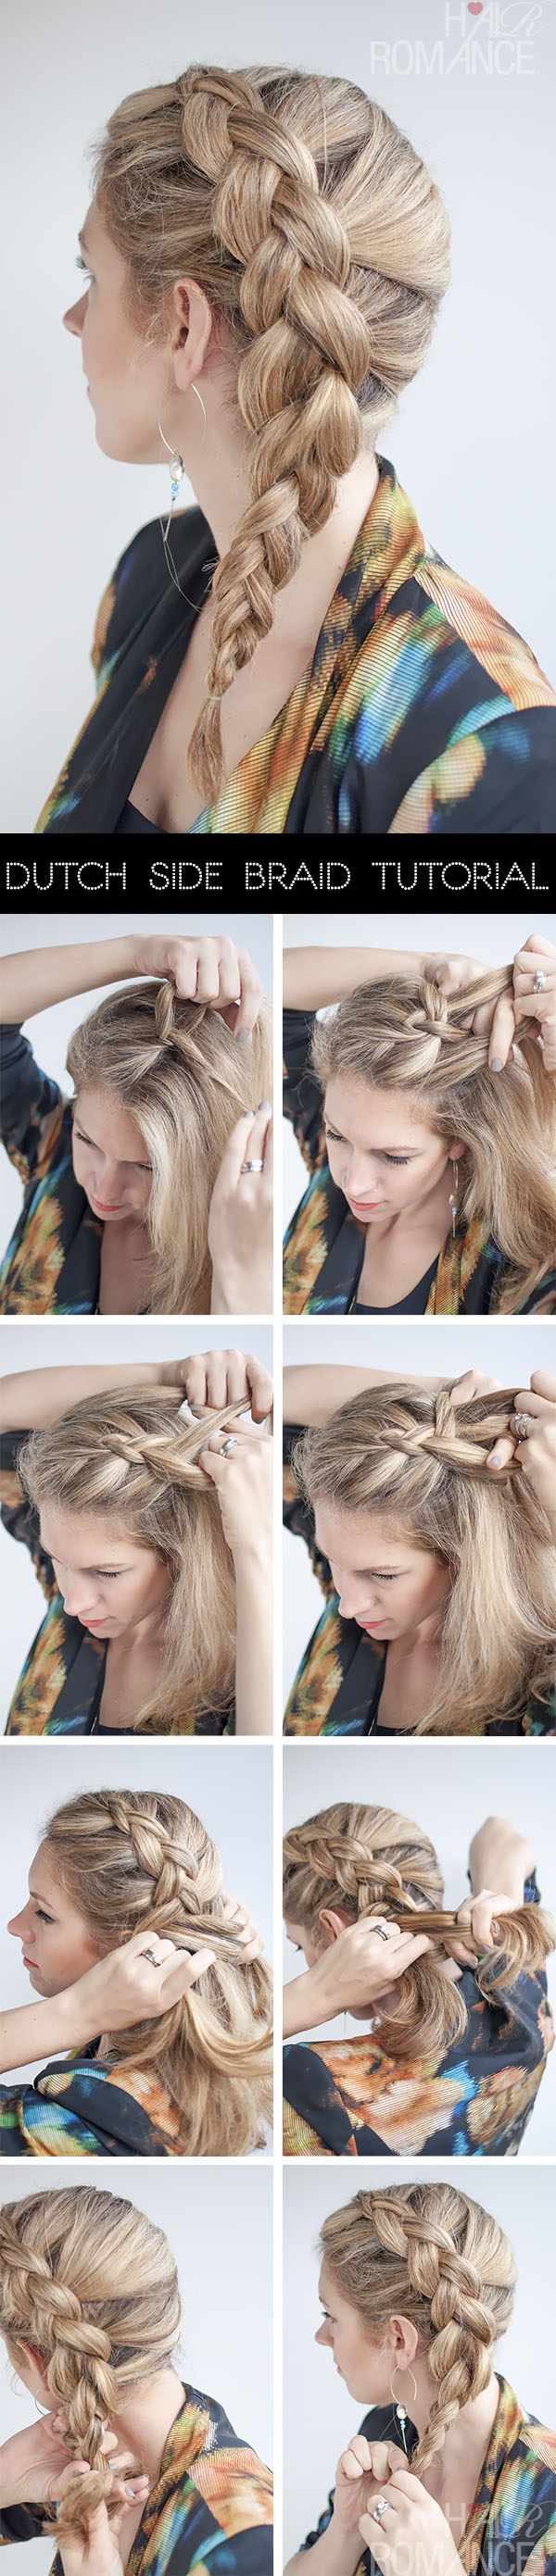 Dutch Side Braid Hairstyle Tutorial